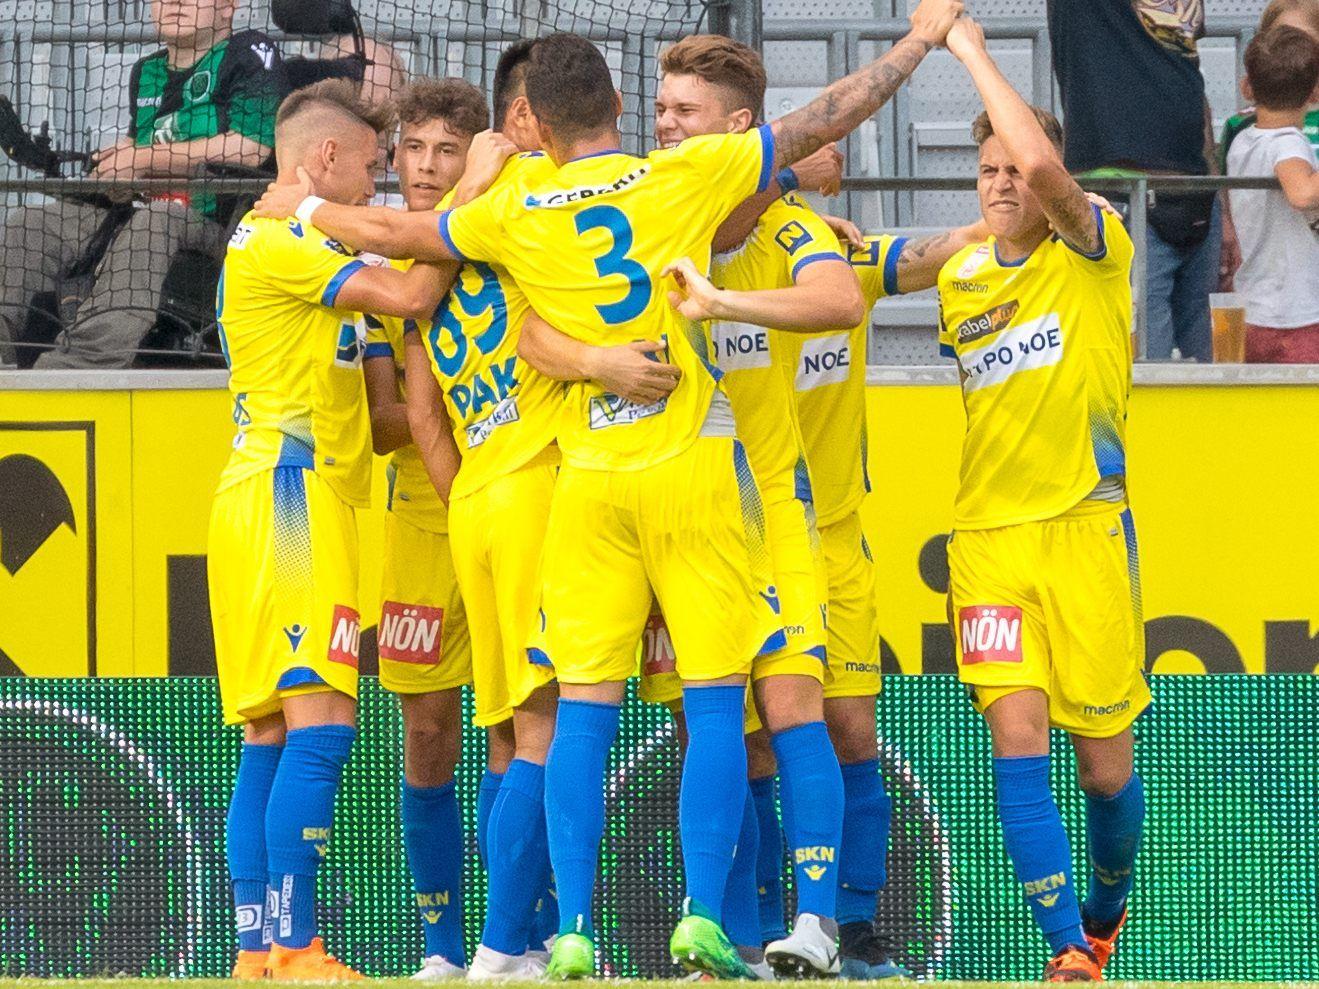 Austria Asko Gmund Results Fixtures Squad Statistics Photos Videos And News Soccerway